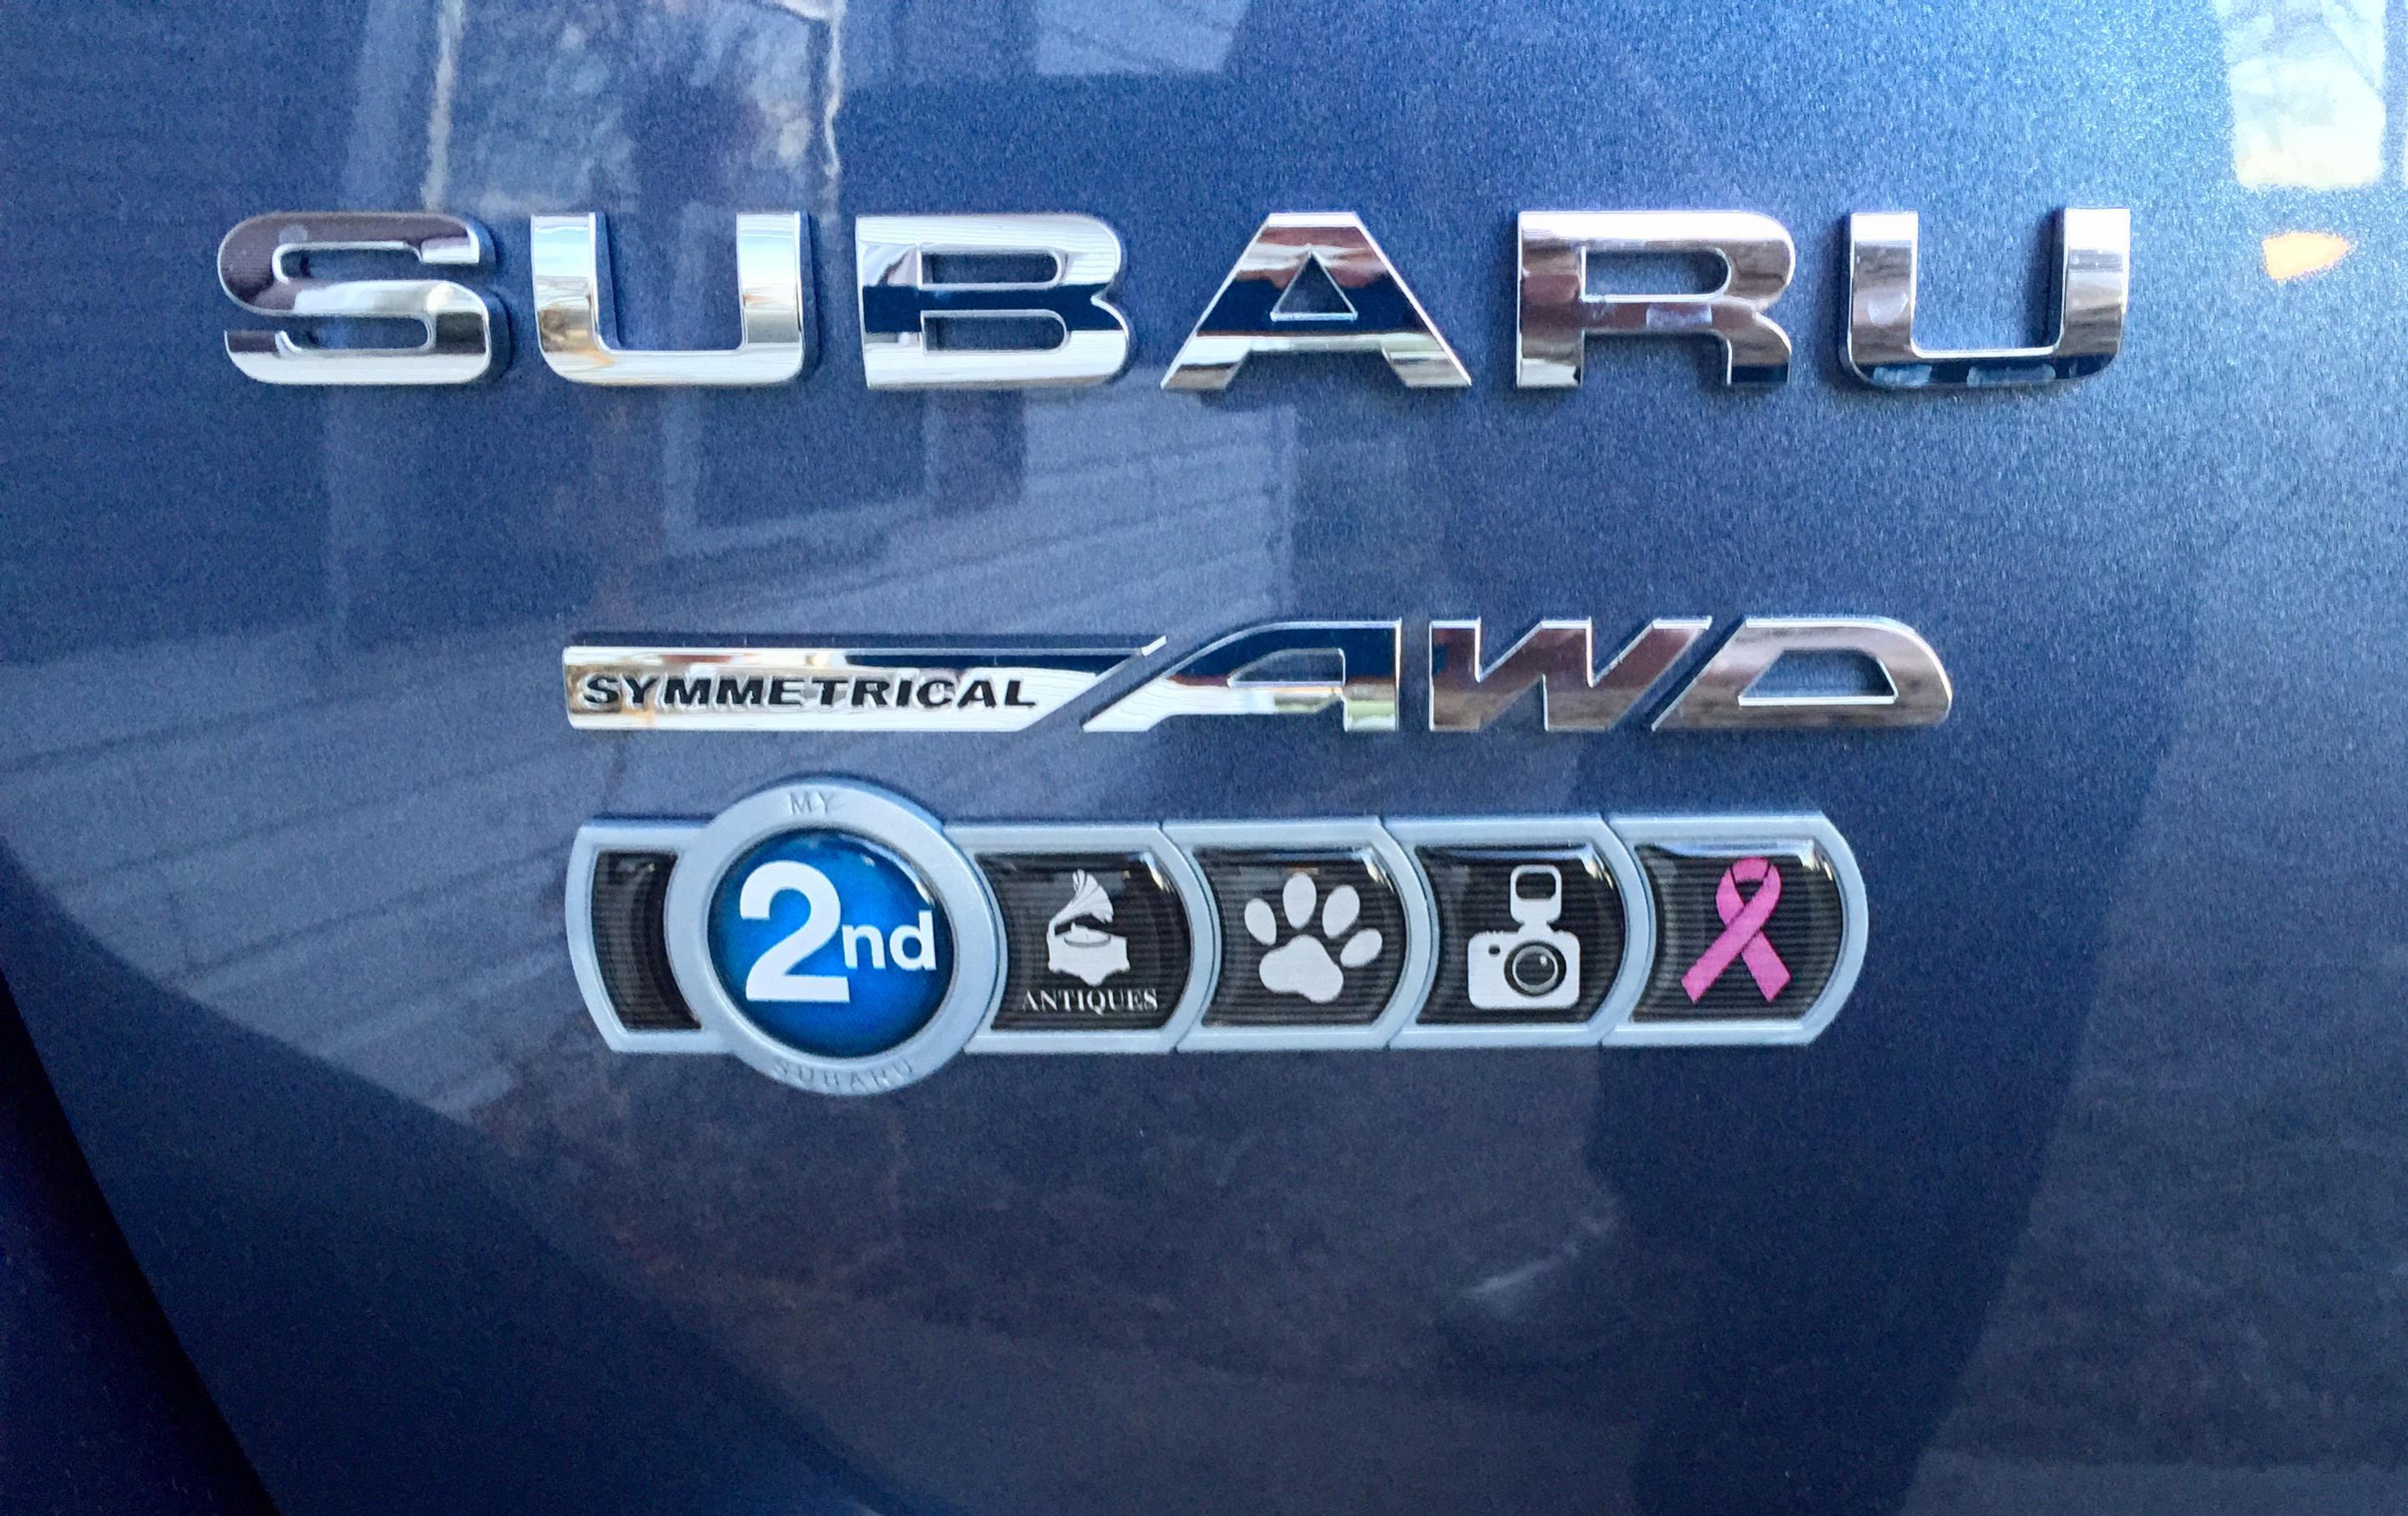 Subaru Badge Of Ownership >> Badge Of Ownership Do You Have One Subaru Outback Subaru